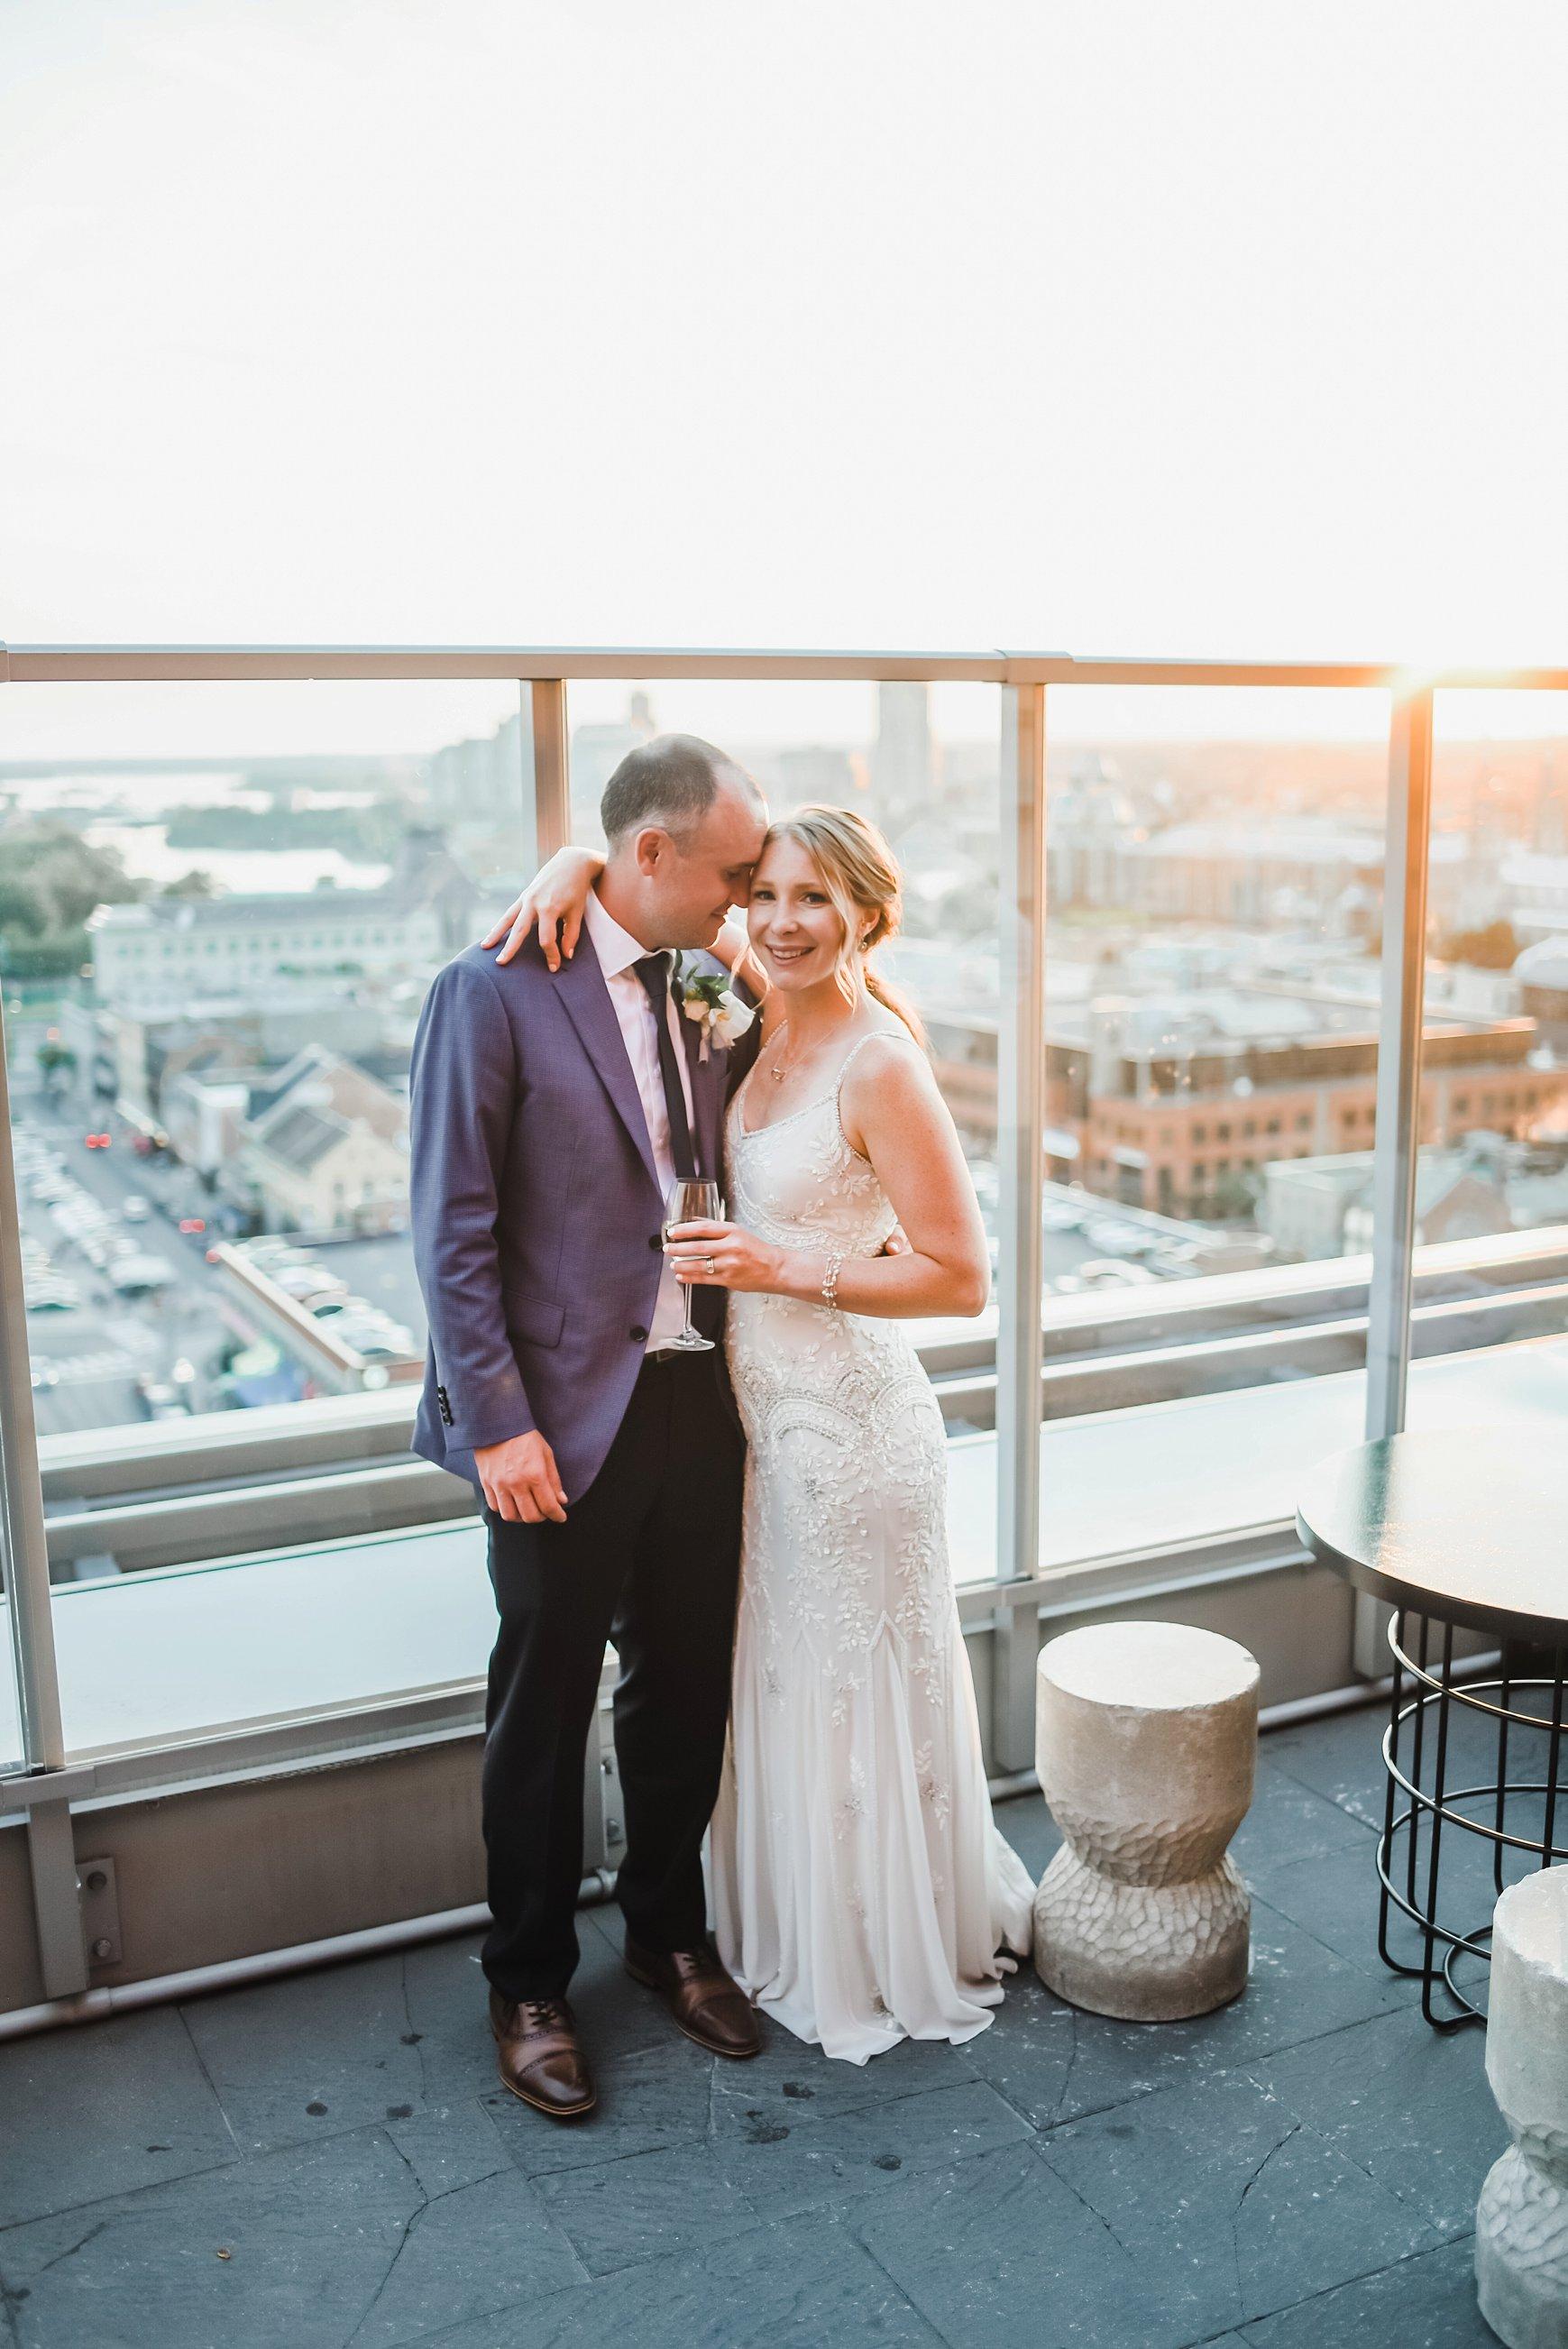 light airy indie fine art ottawa wedding photographer | Ali and Batoul Photography_0702.jpg